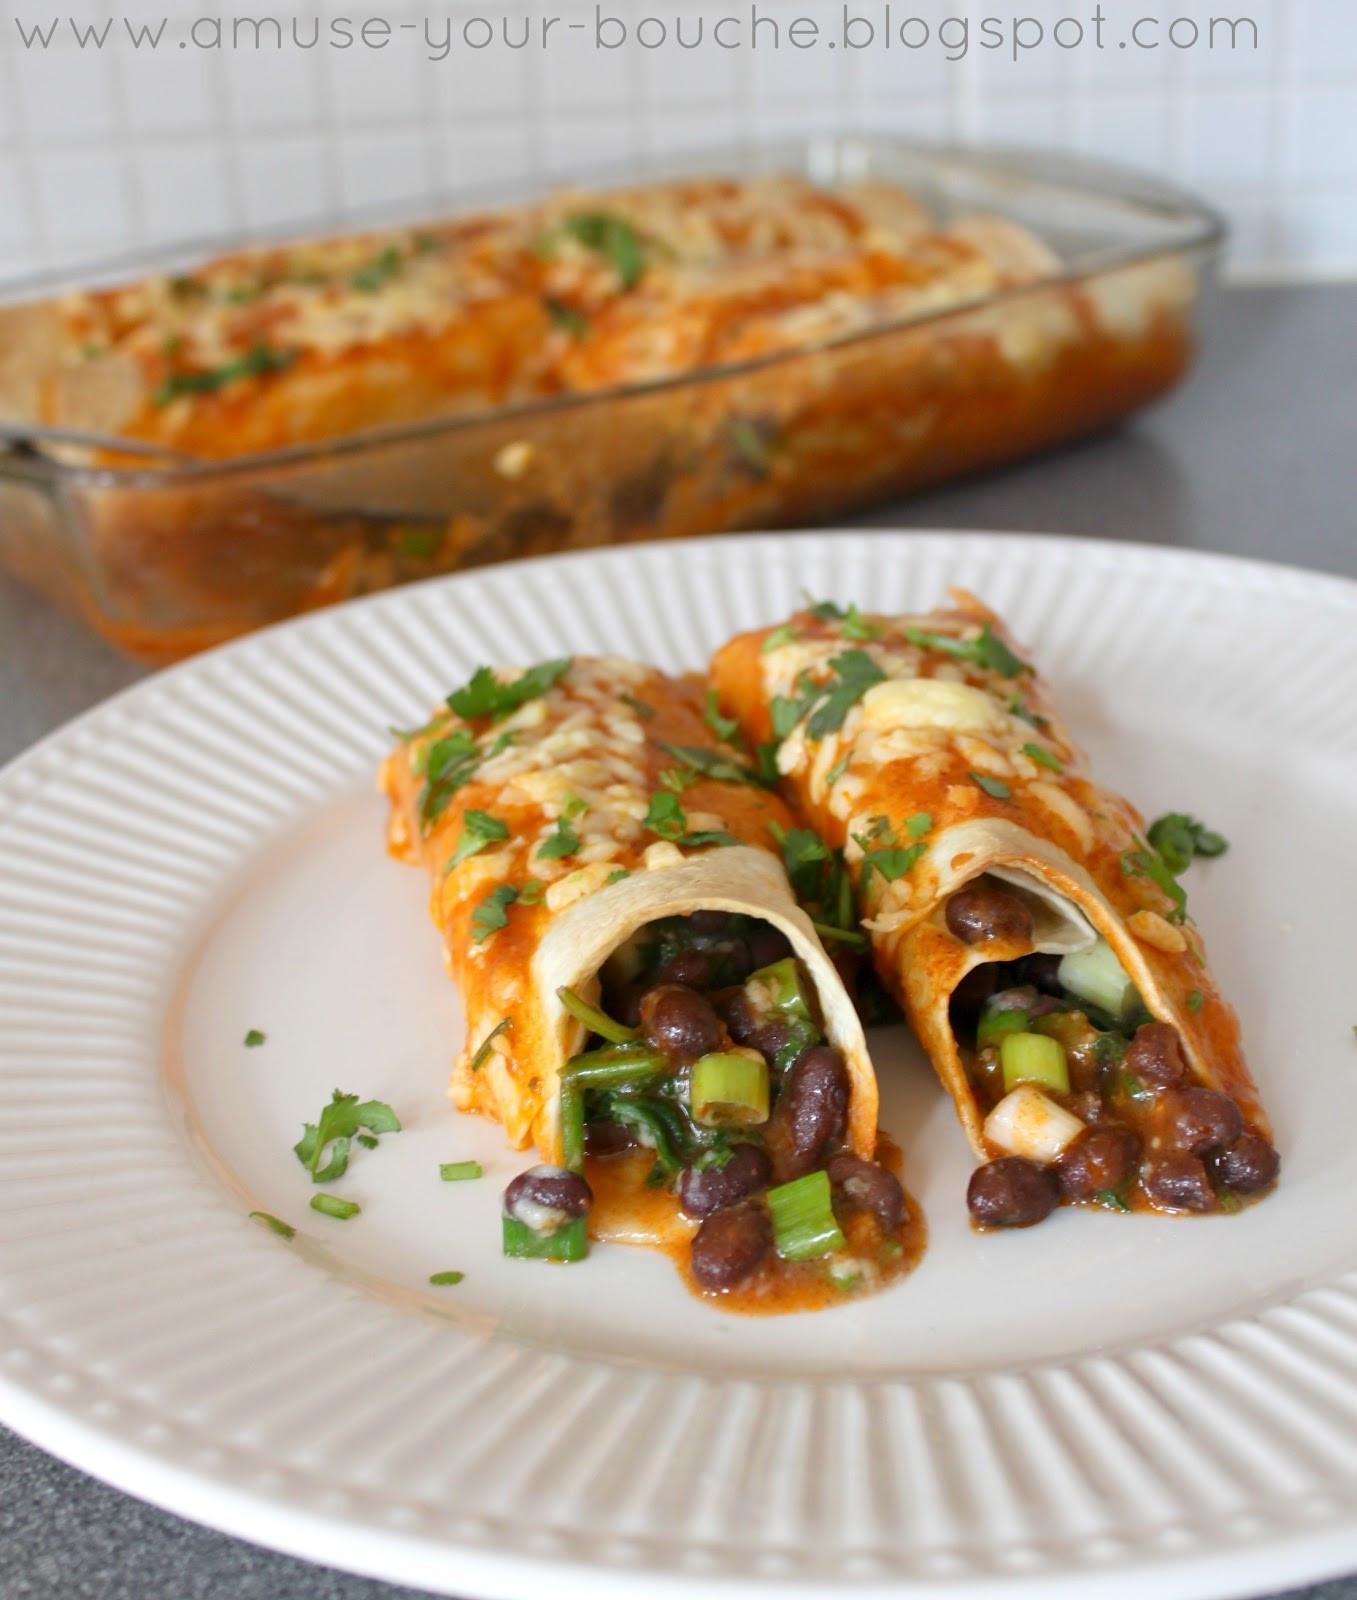 Healthy Black Bean Enchiladas  Spinach and black bean enchiladas with homemade sauce